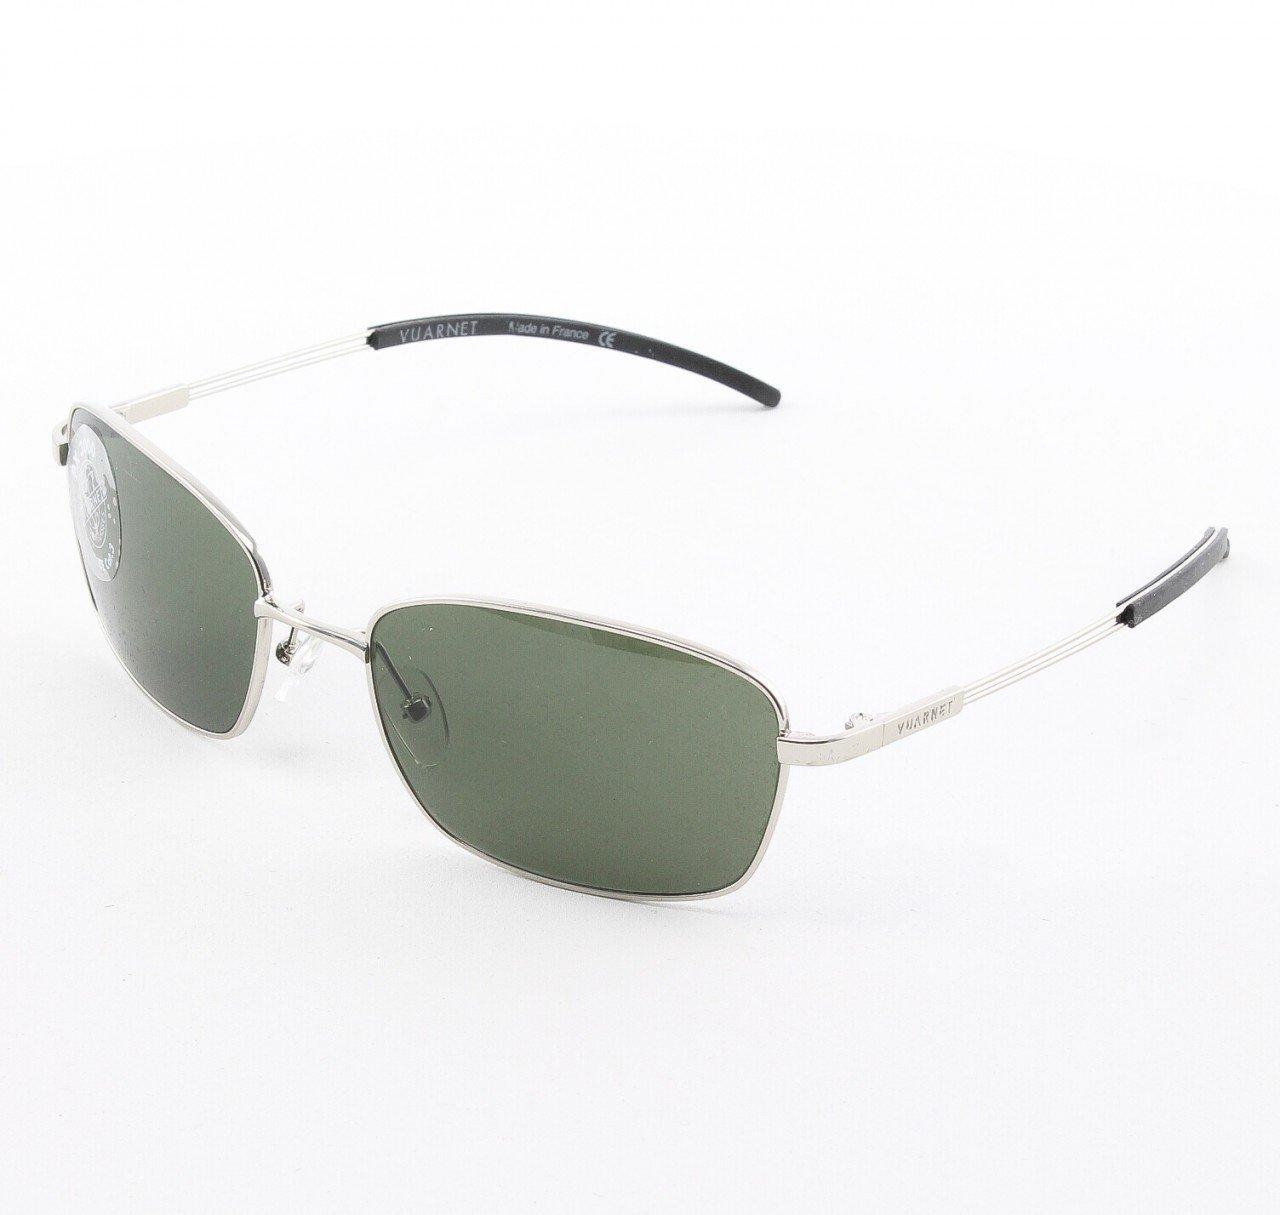 Vuarnet VL 1143 Sunglasses Col. L00B 1121 Black & Chrome with Grey PX3000 Lenses